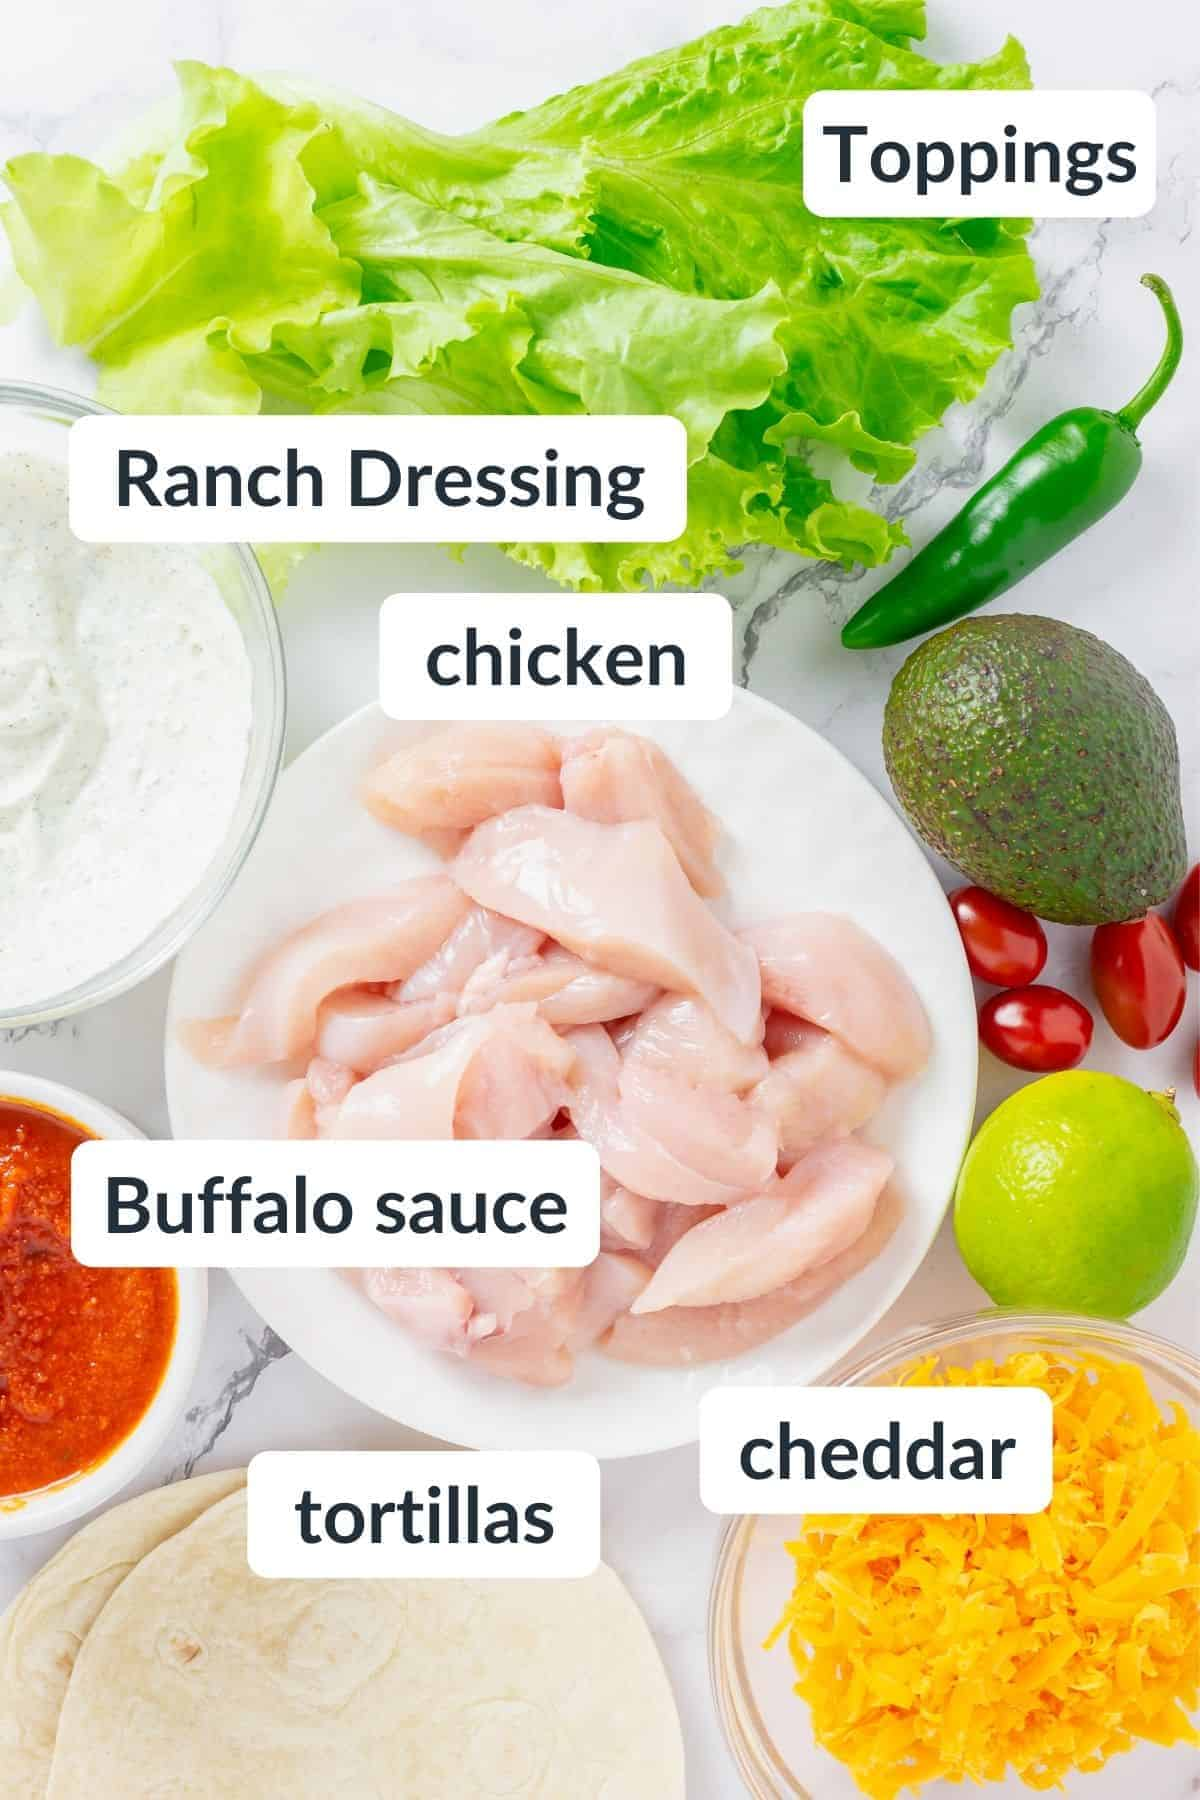 Chicken tostada ingredients